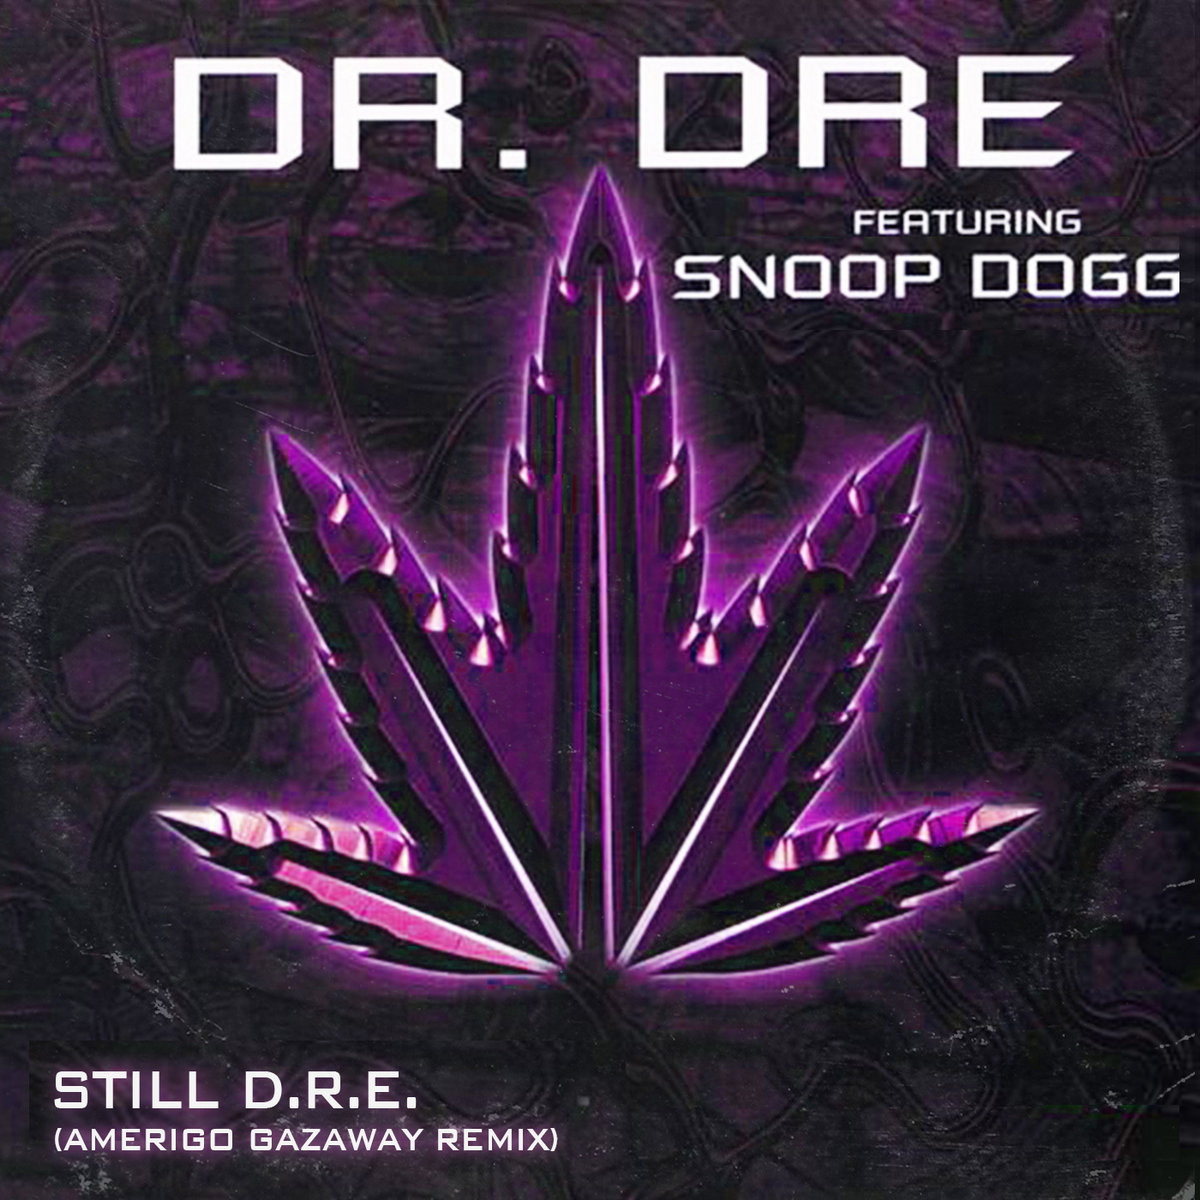 Still D R E  feat  Snoop Dogg (Amerigo Gazaway Remix